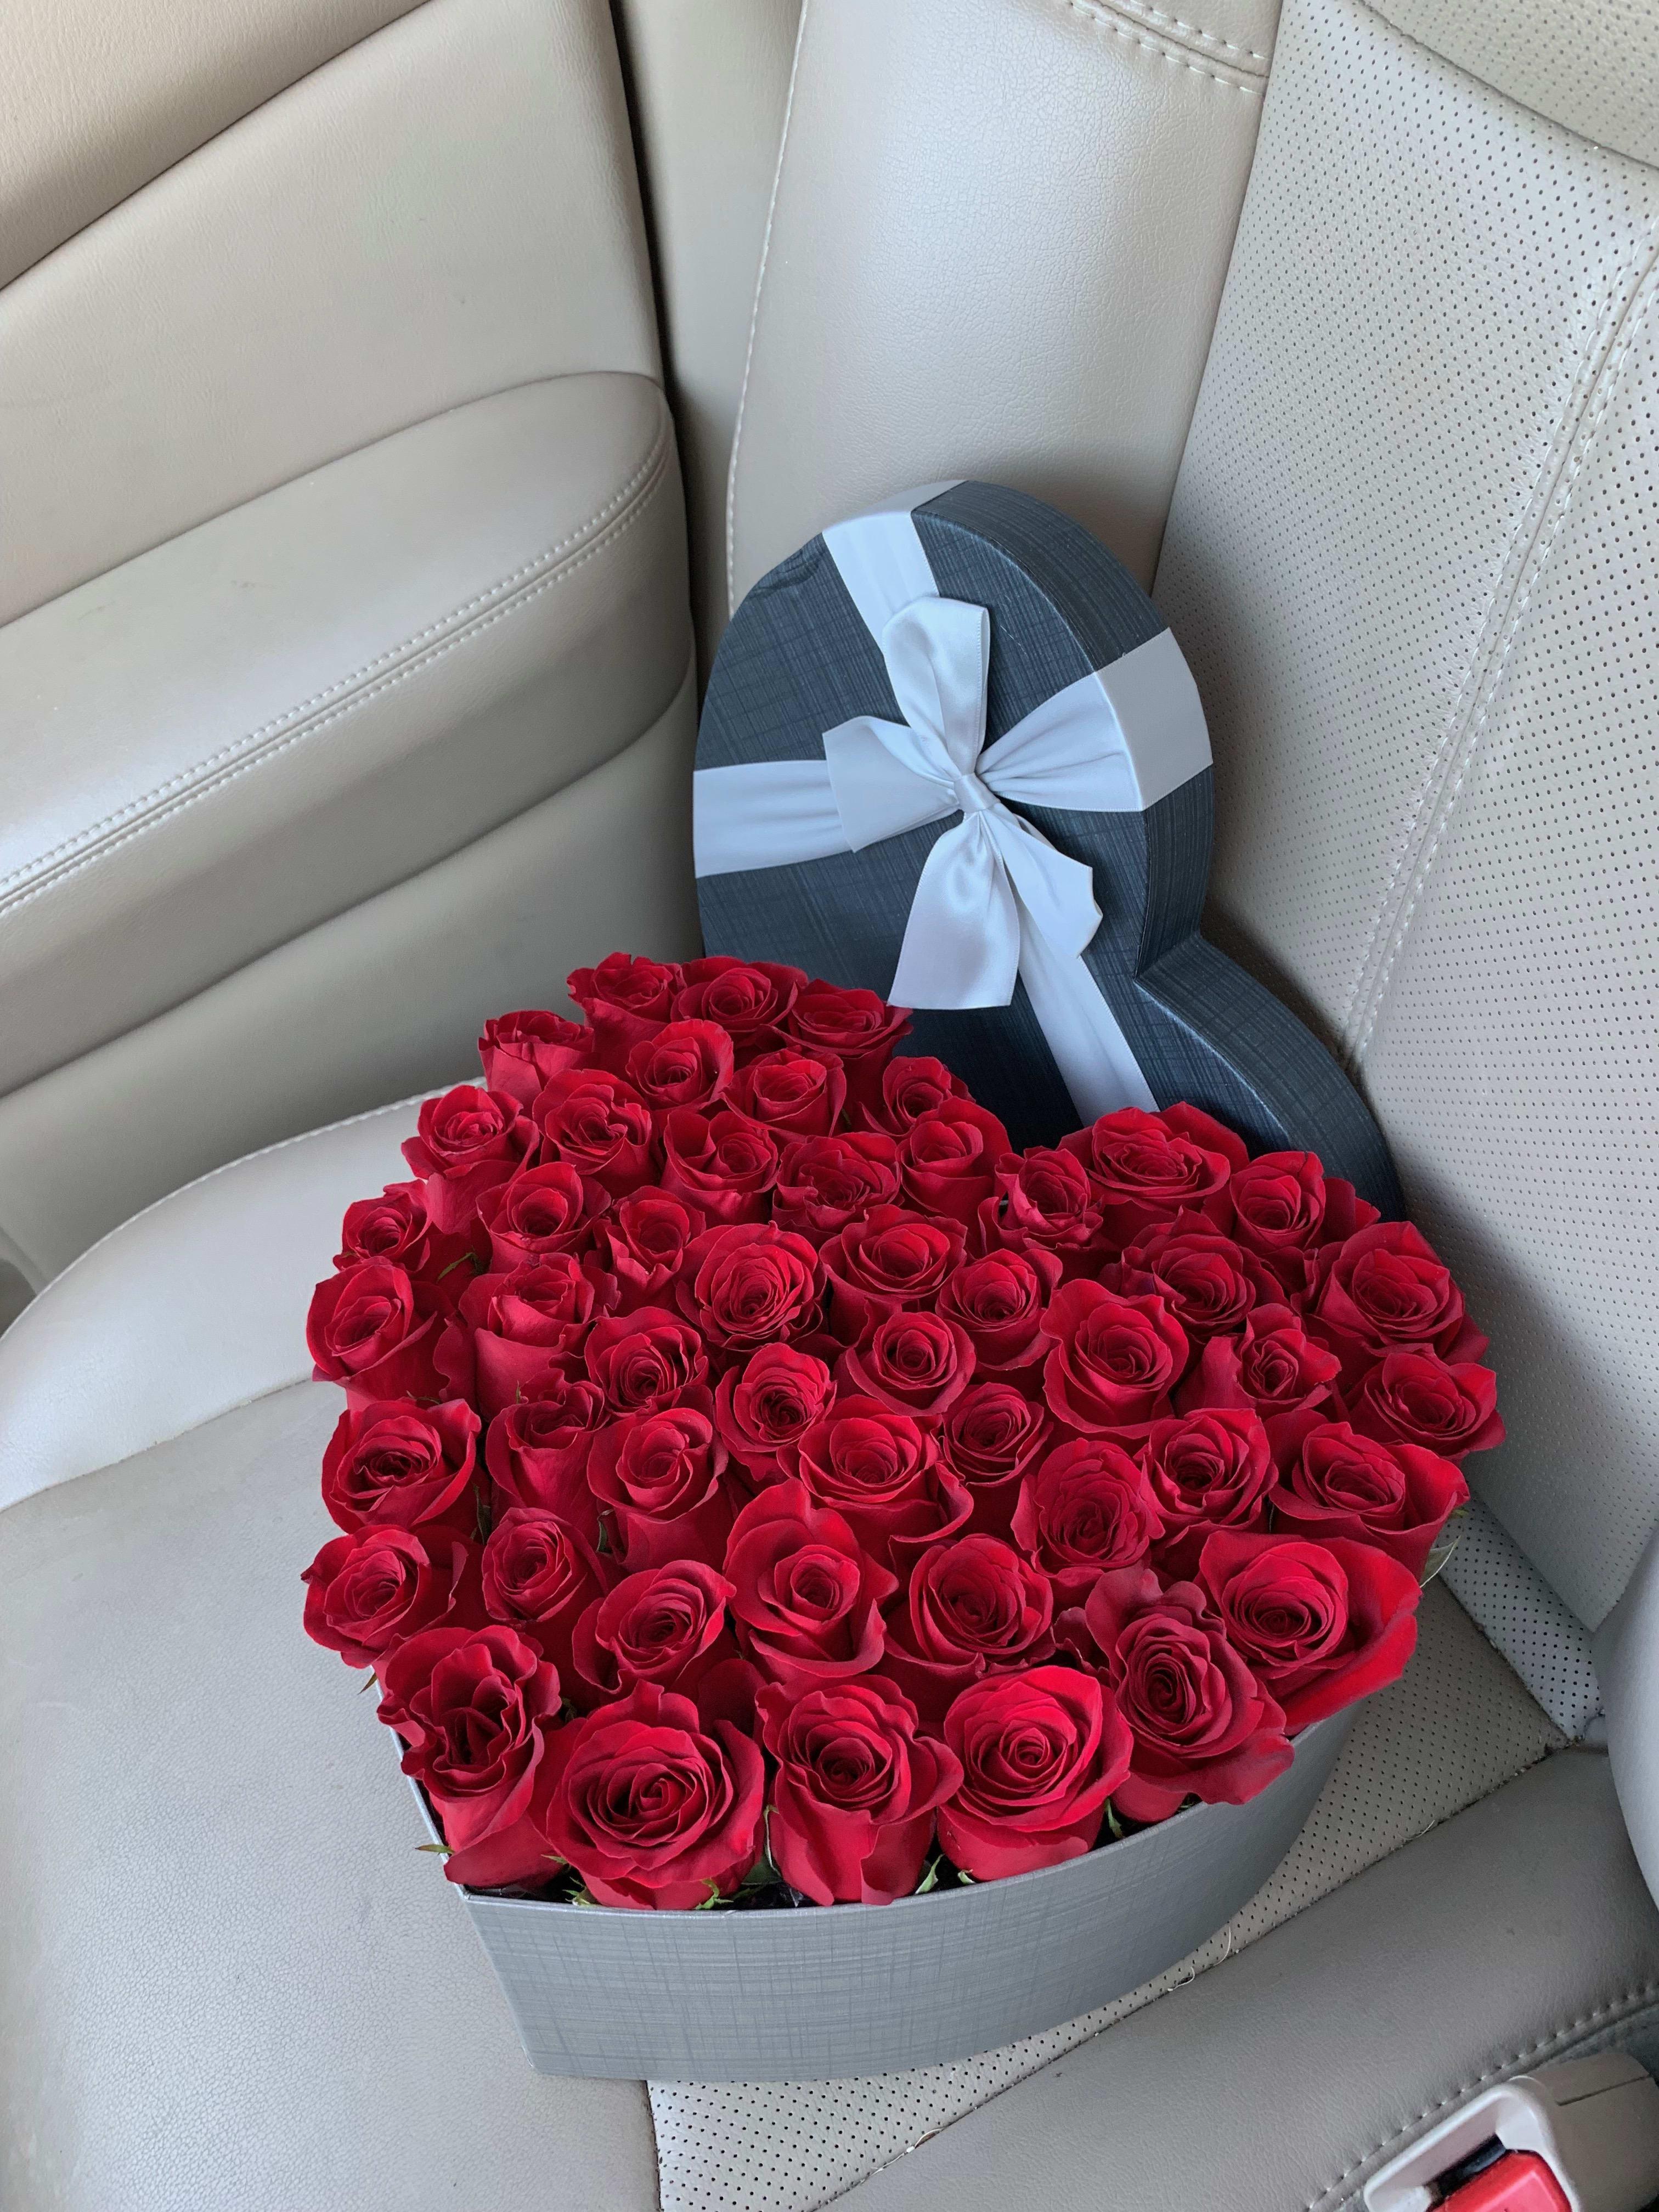 50 Red Roses Arrangement In Heart Box In Miami Fl Luxury Flowers Miami